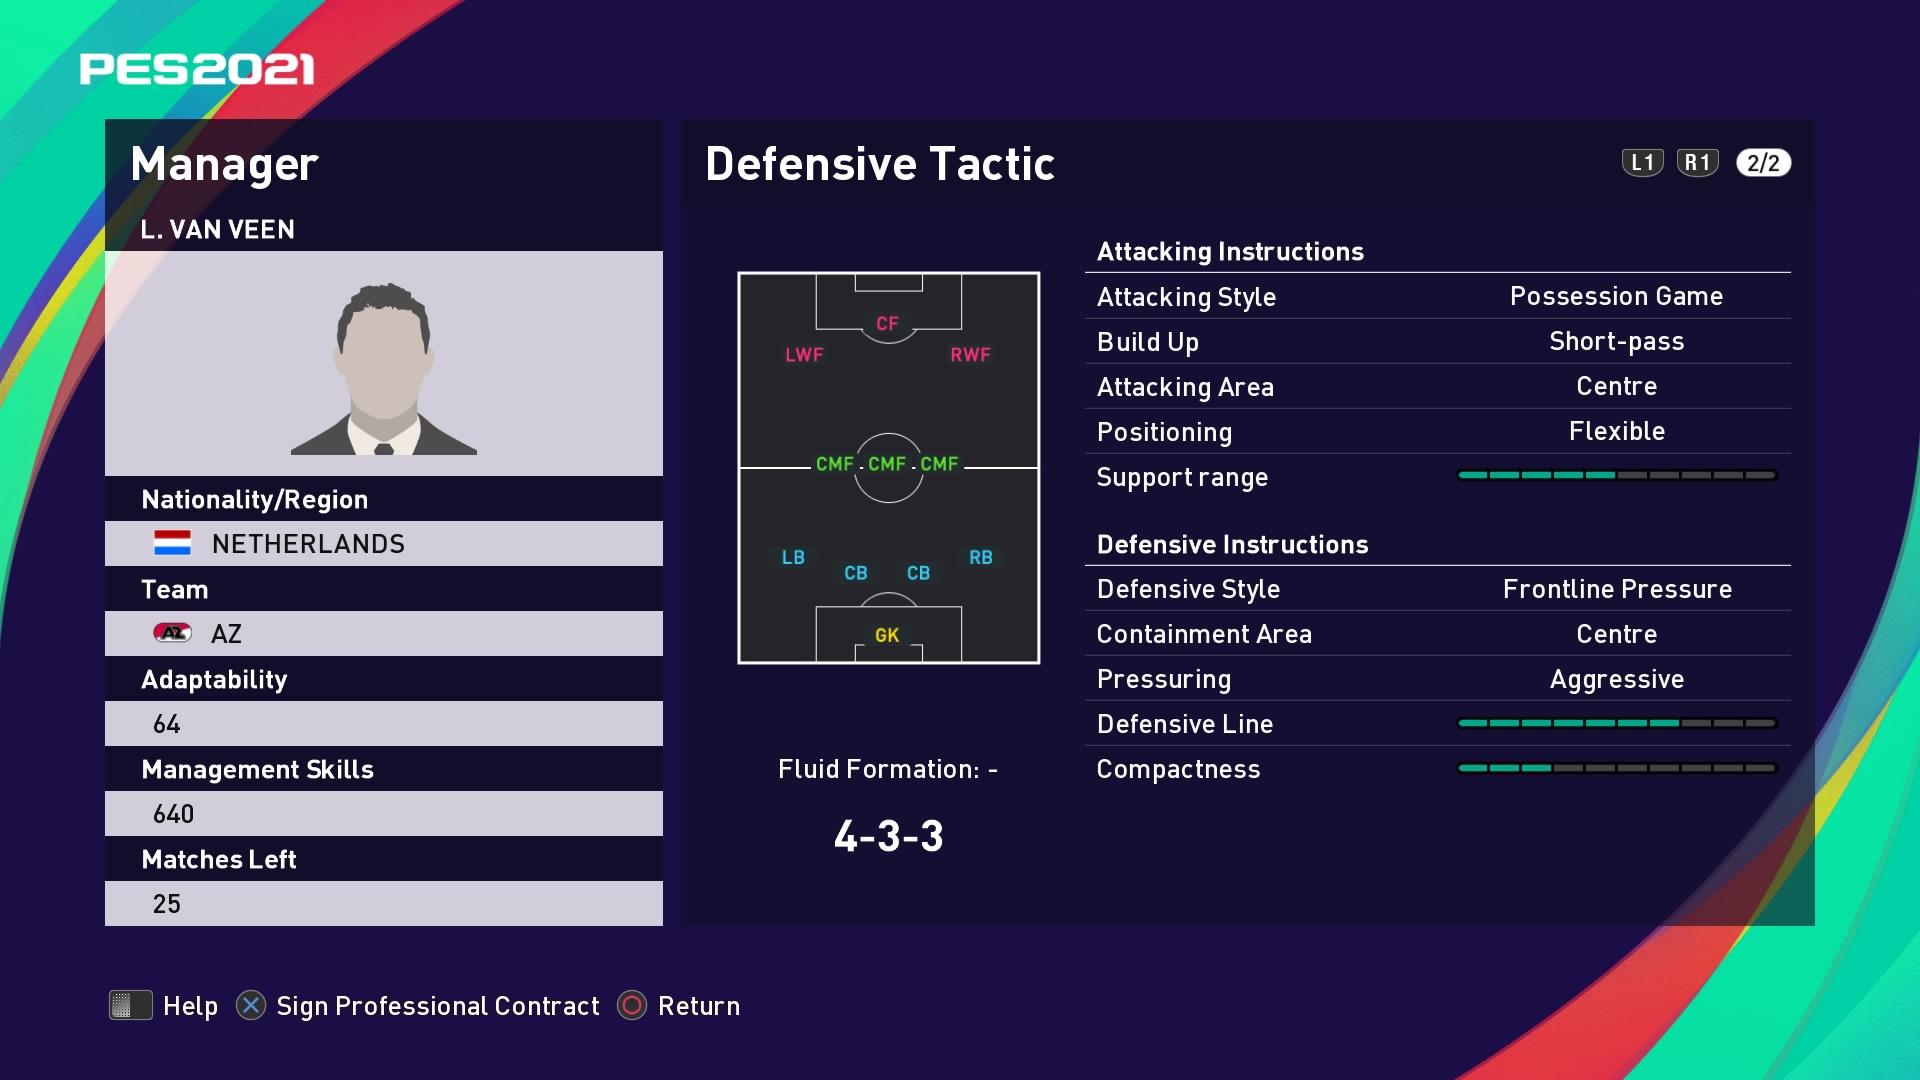 L. Van Veen (Arne Slot) Defensive Tactic in PES 2021 myClub